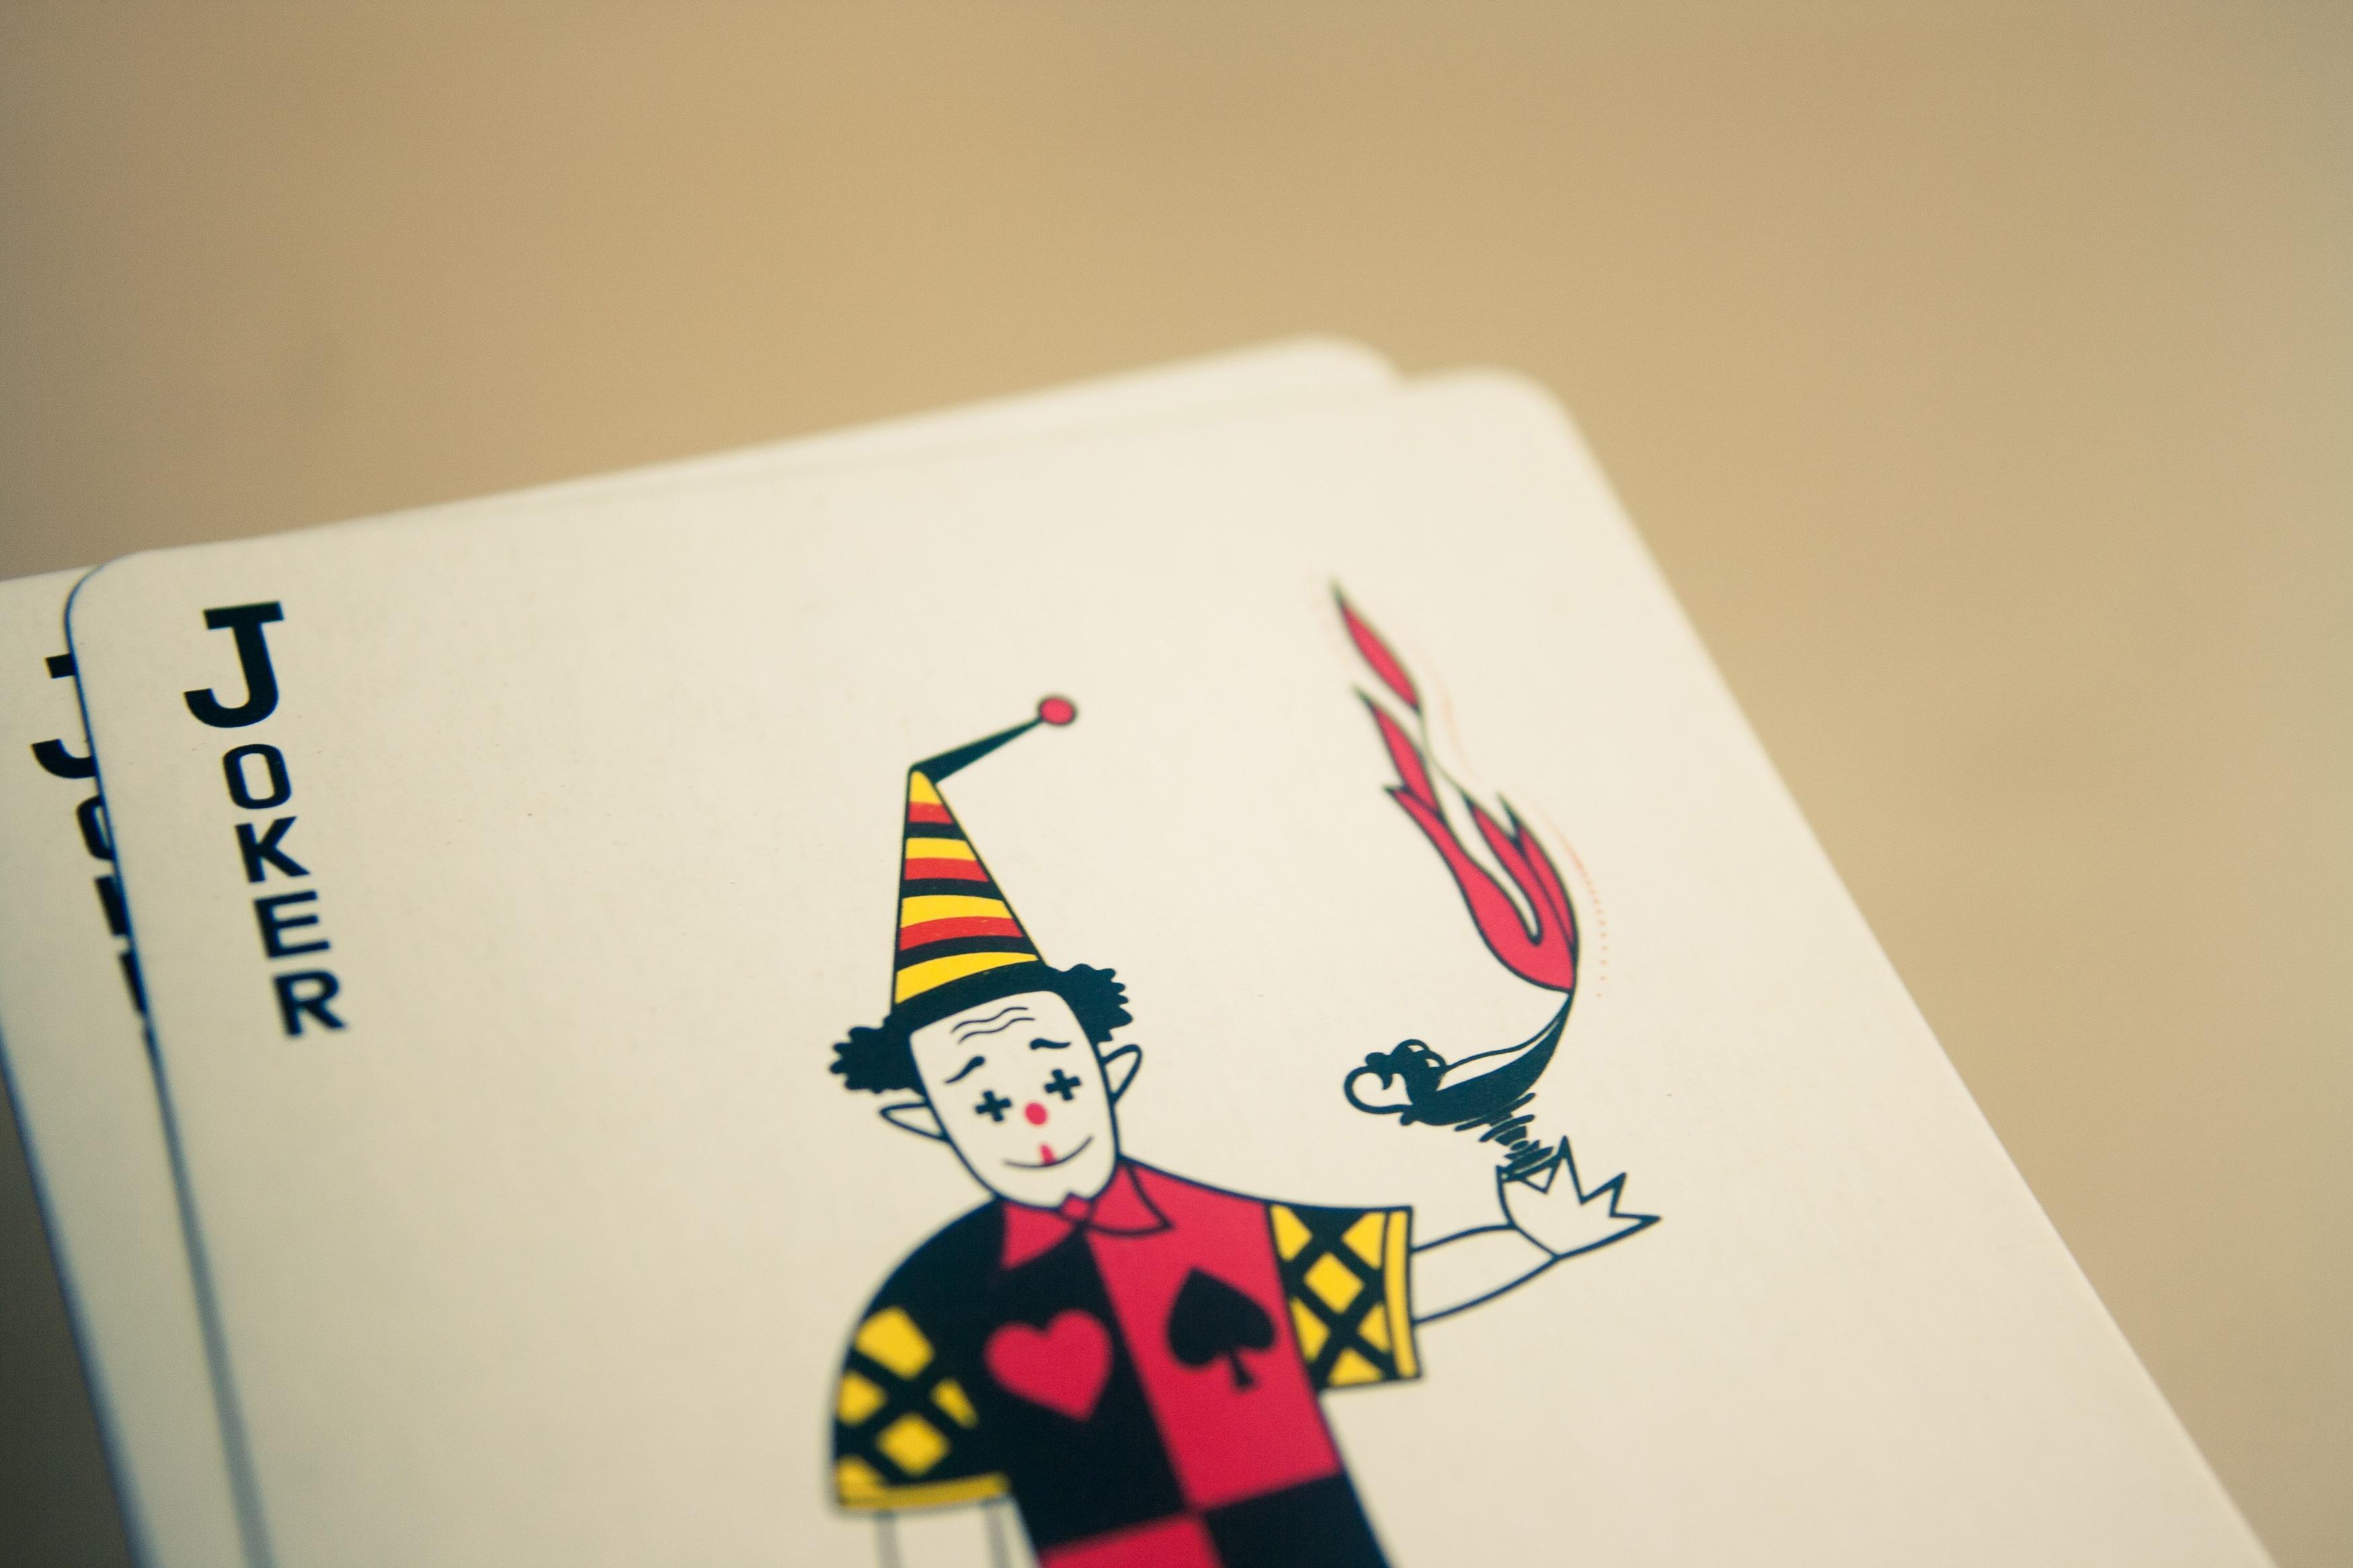 blanco juego tarjetas art bosquejo dibujo ilustracin diseo caligrafa casino juego bromista forma suerte pker diseo